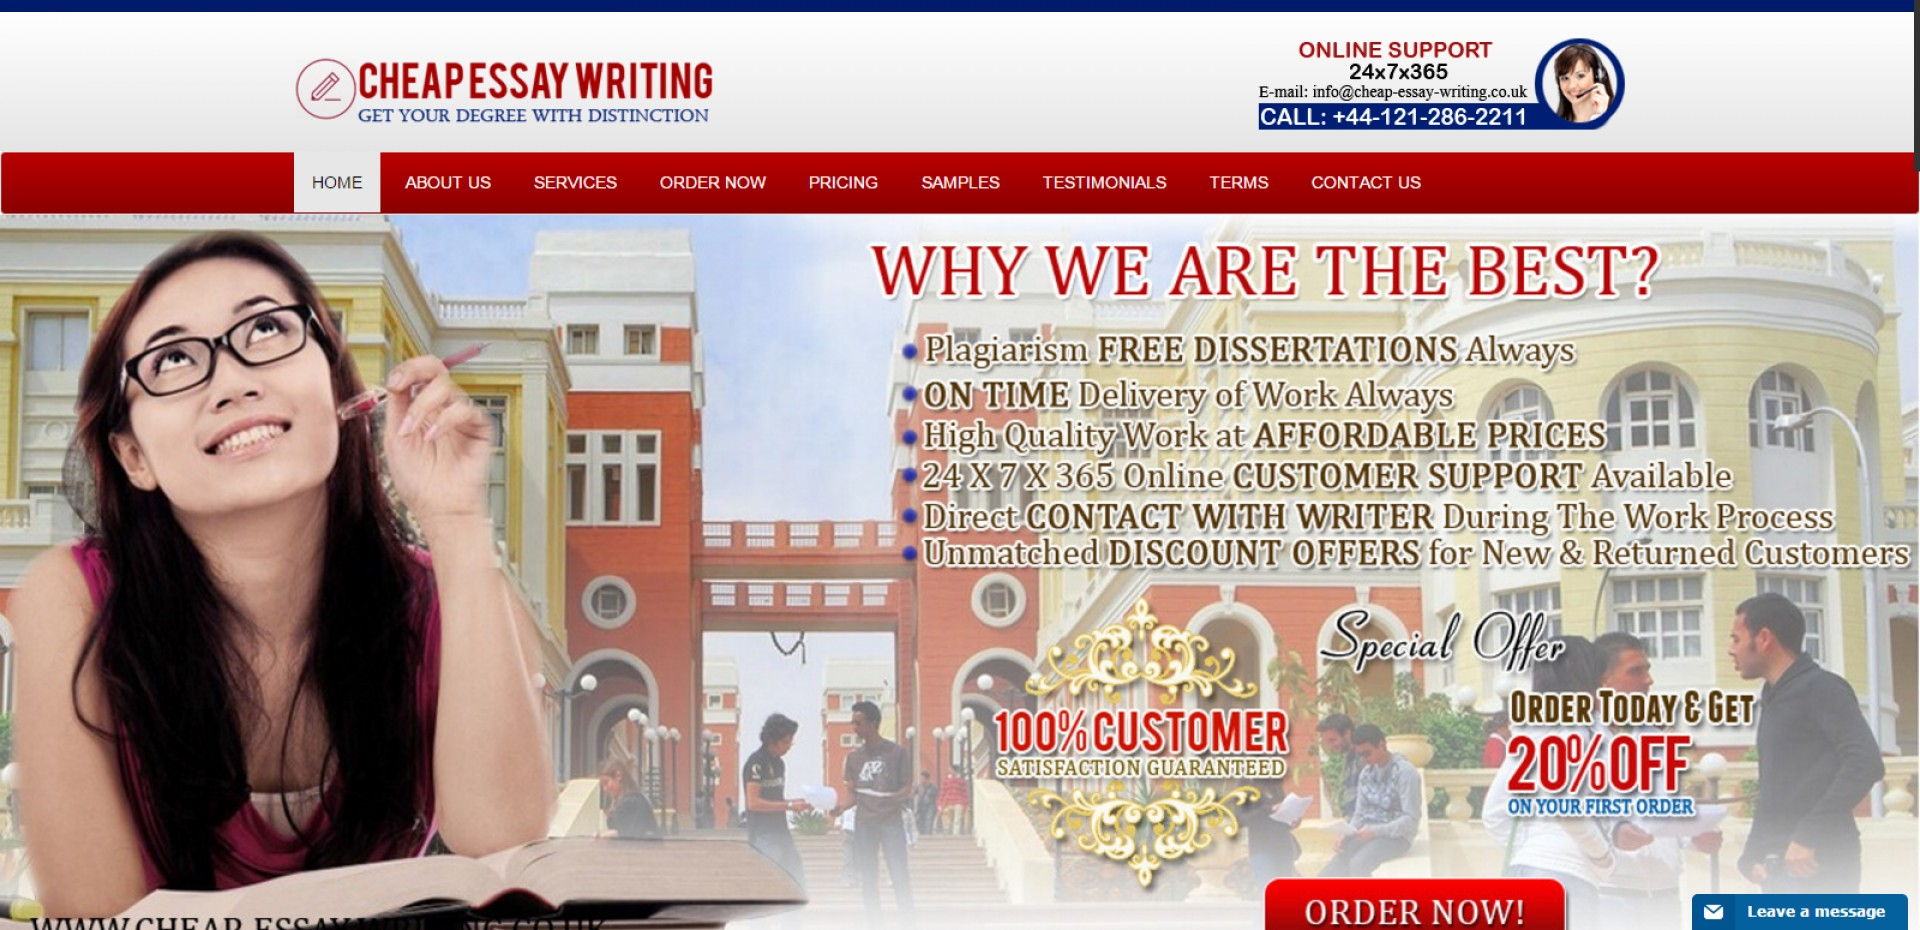 010 Cheap Essay Writing Services Uk Custom Service Impressive Are Legal Free Canada 1920